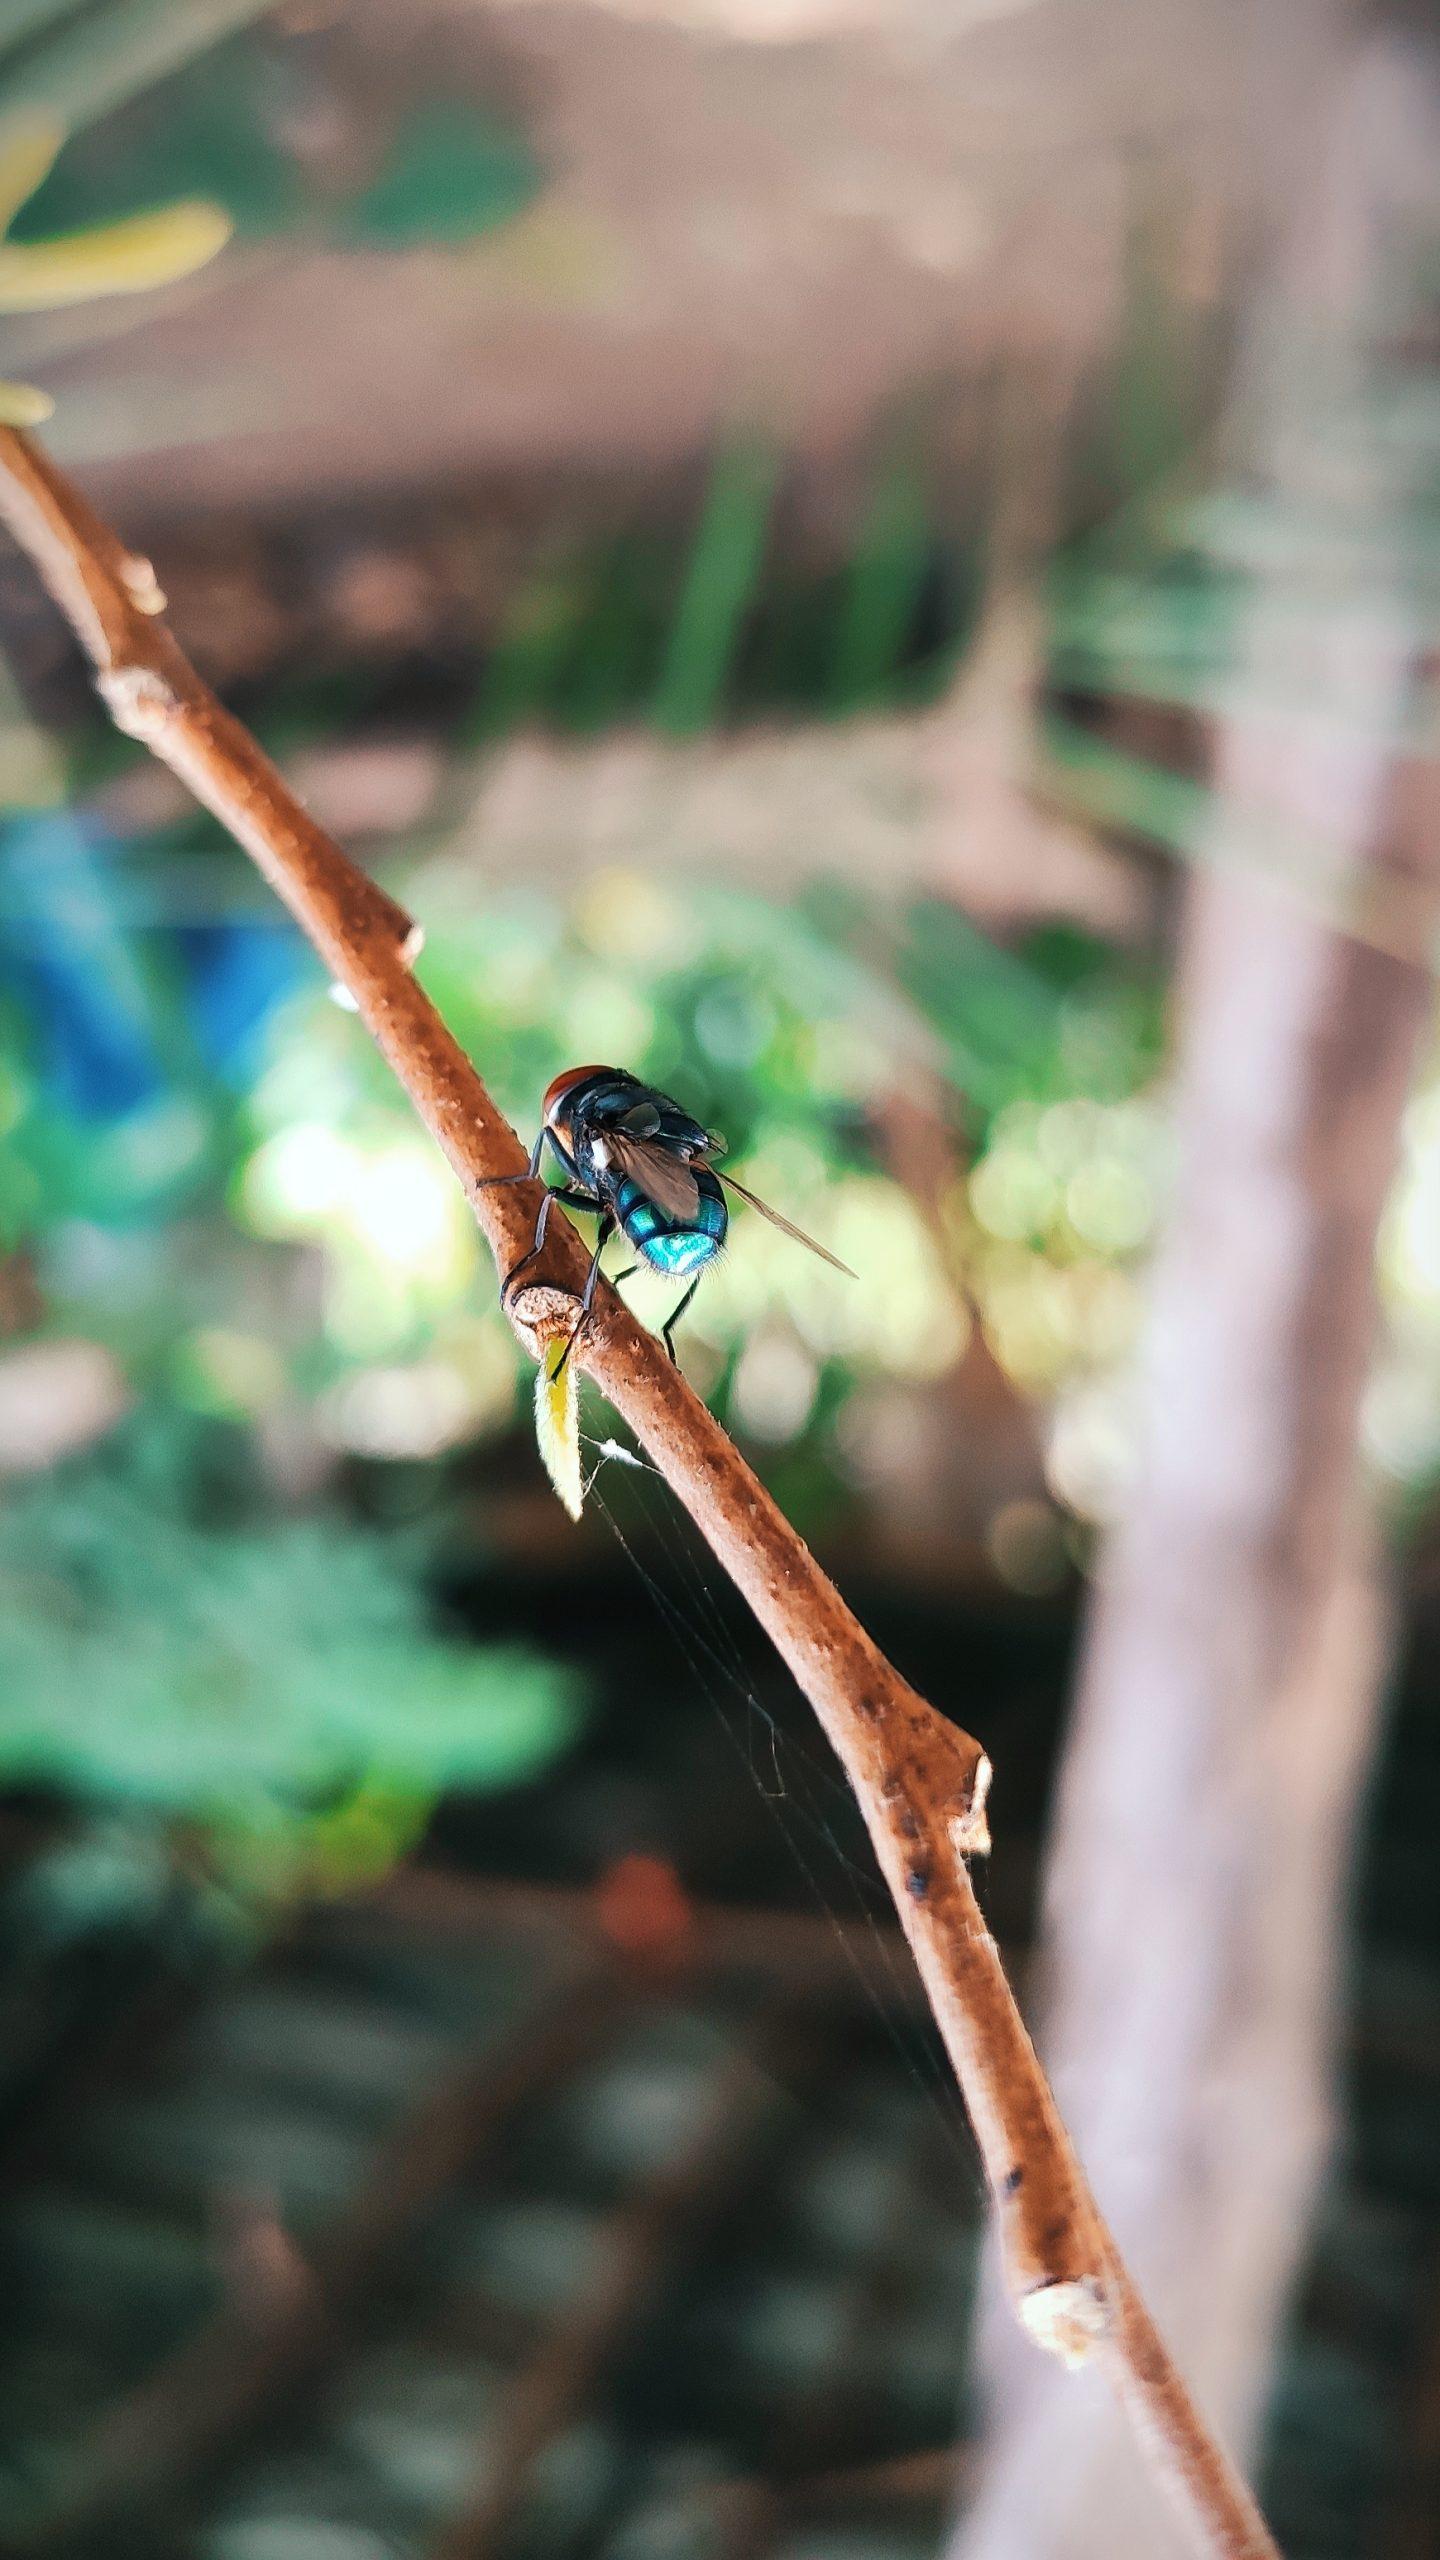 Bee on plant stem